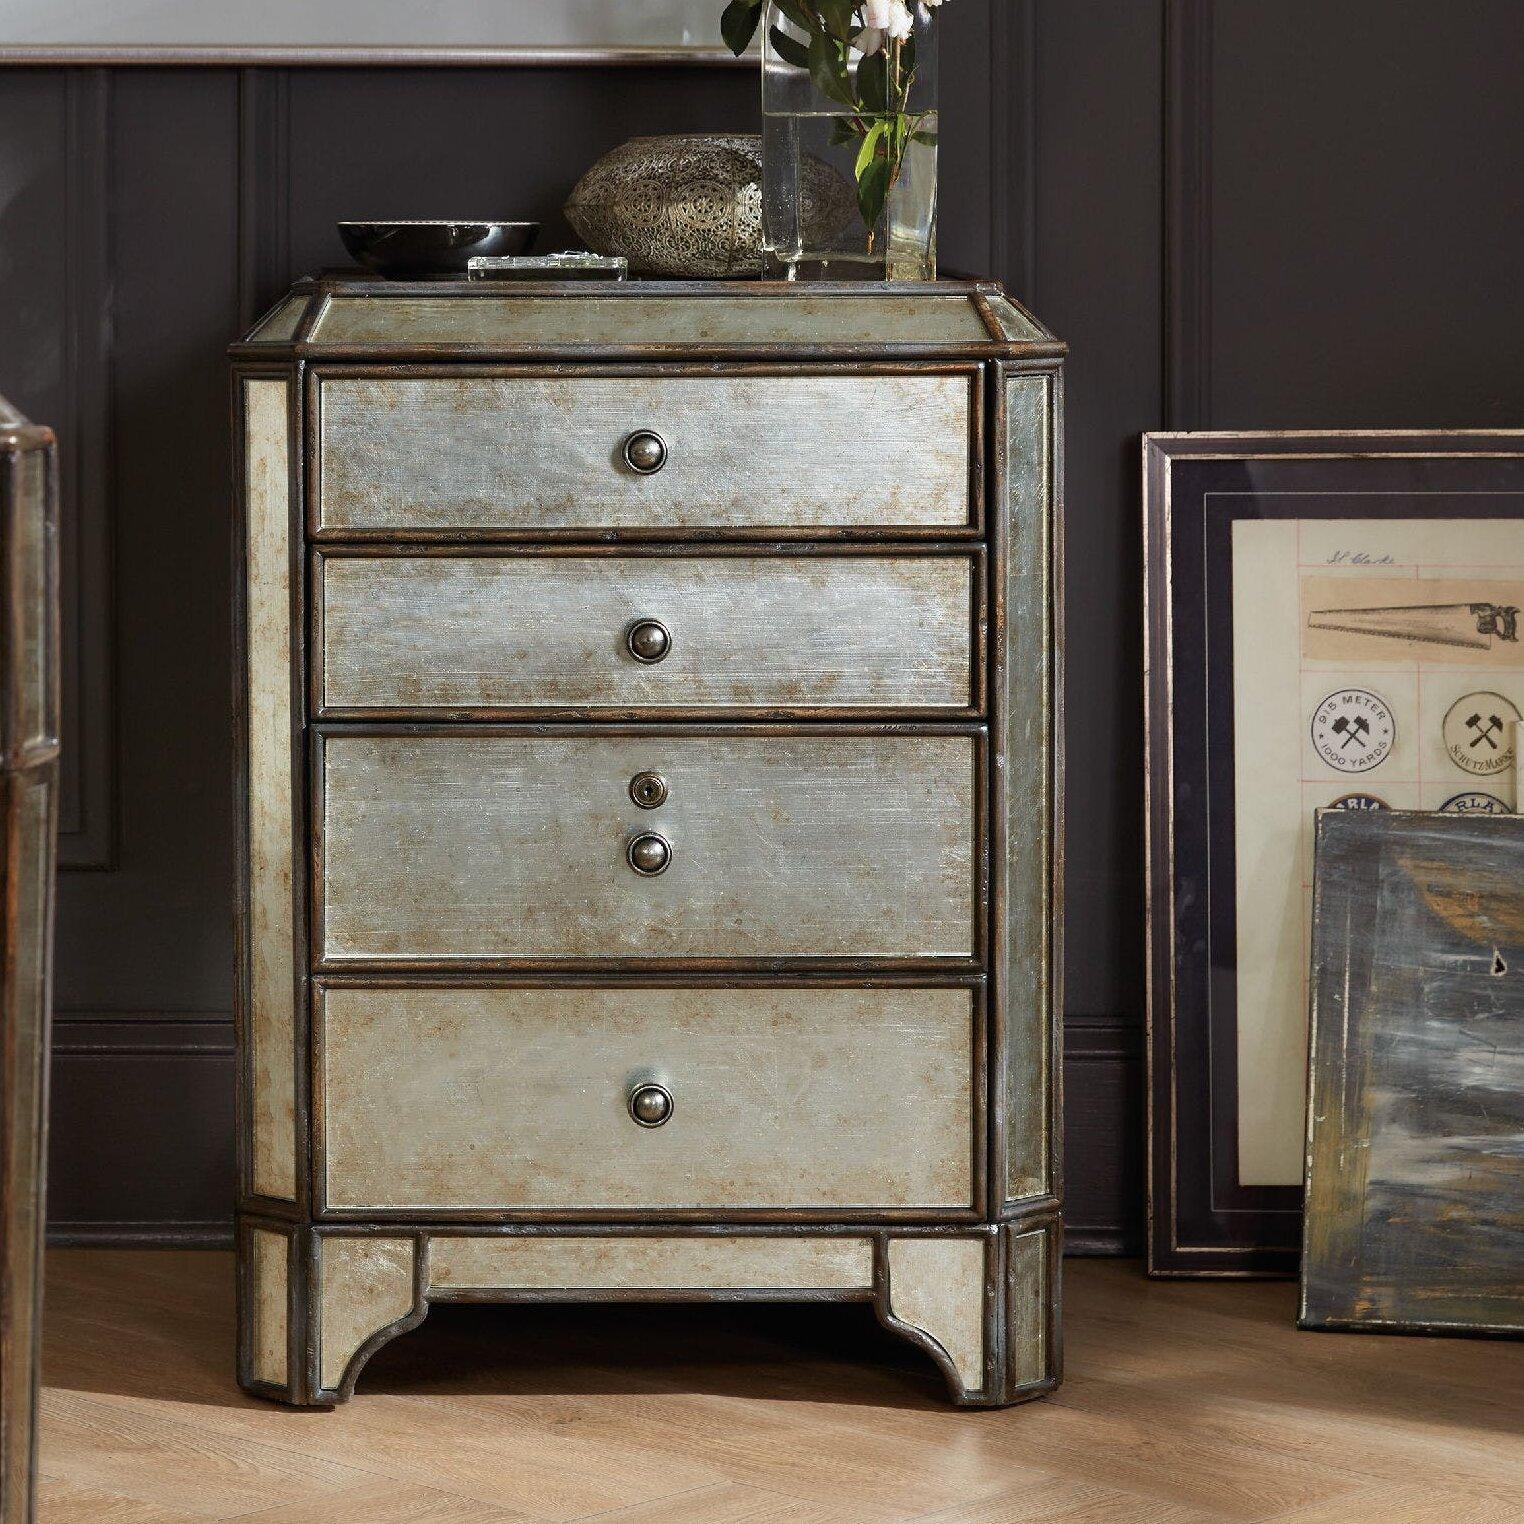 Hooker Furniture Arabella 3 Drawer Vertical Filing Cabinet Wayfair Ca